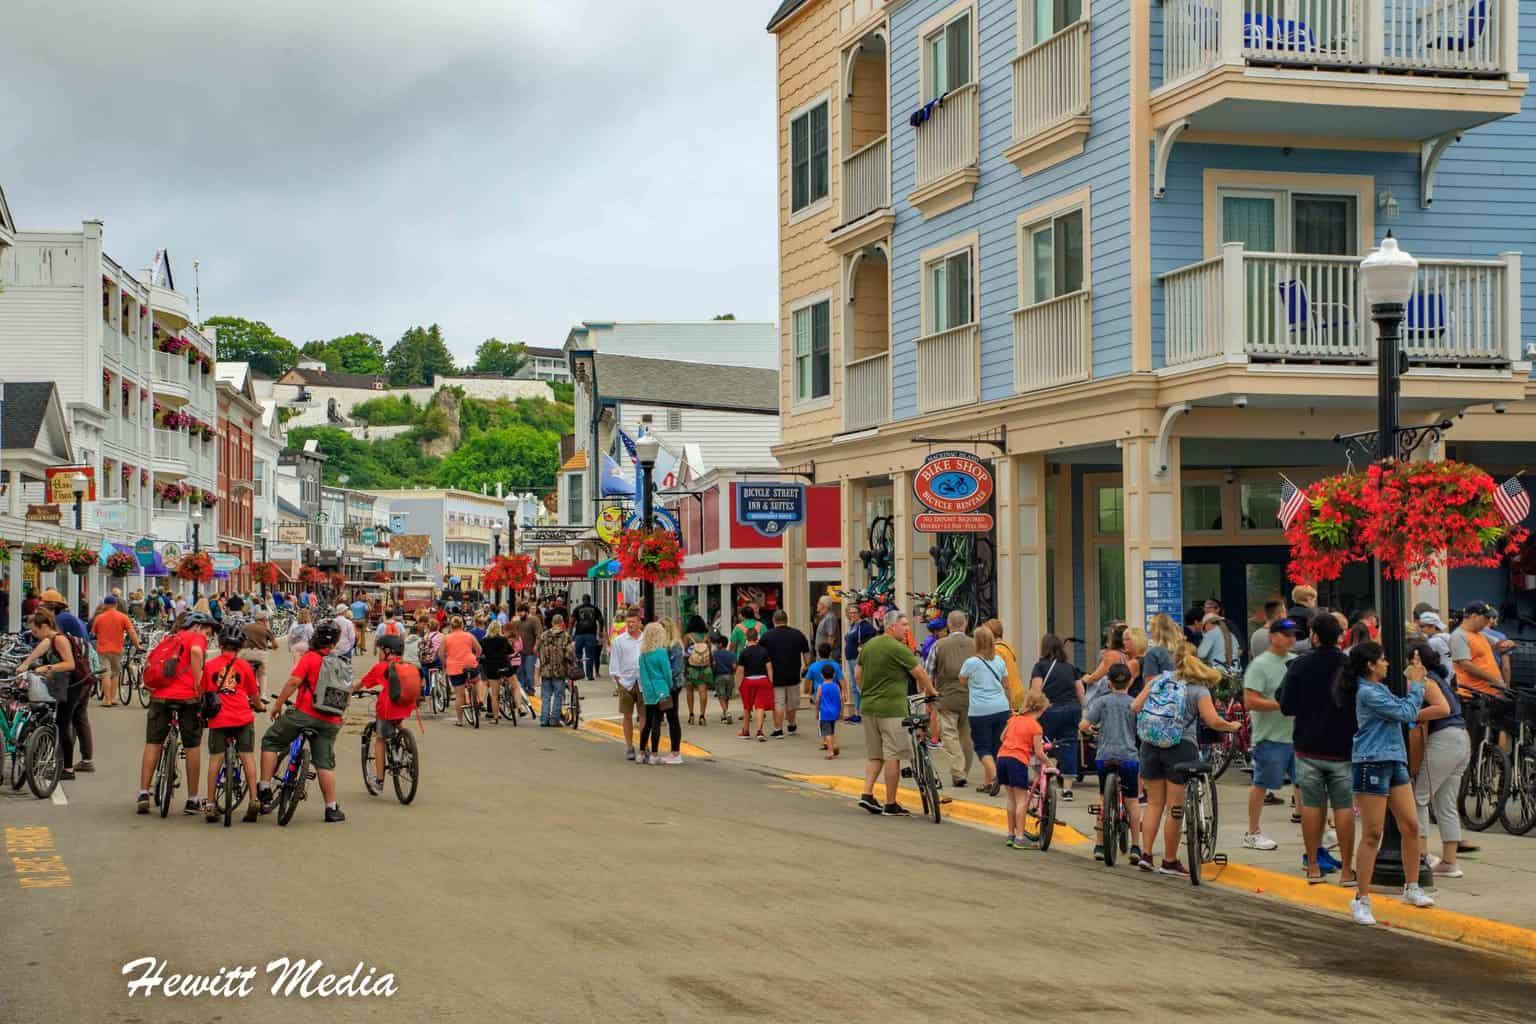 Historic Downtown Mackinac Island